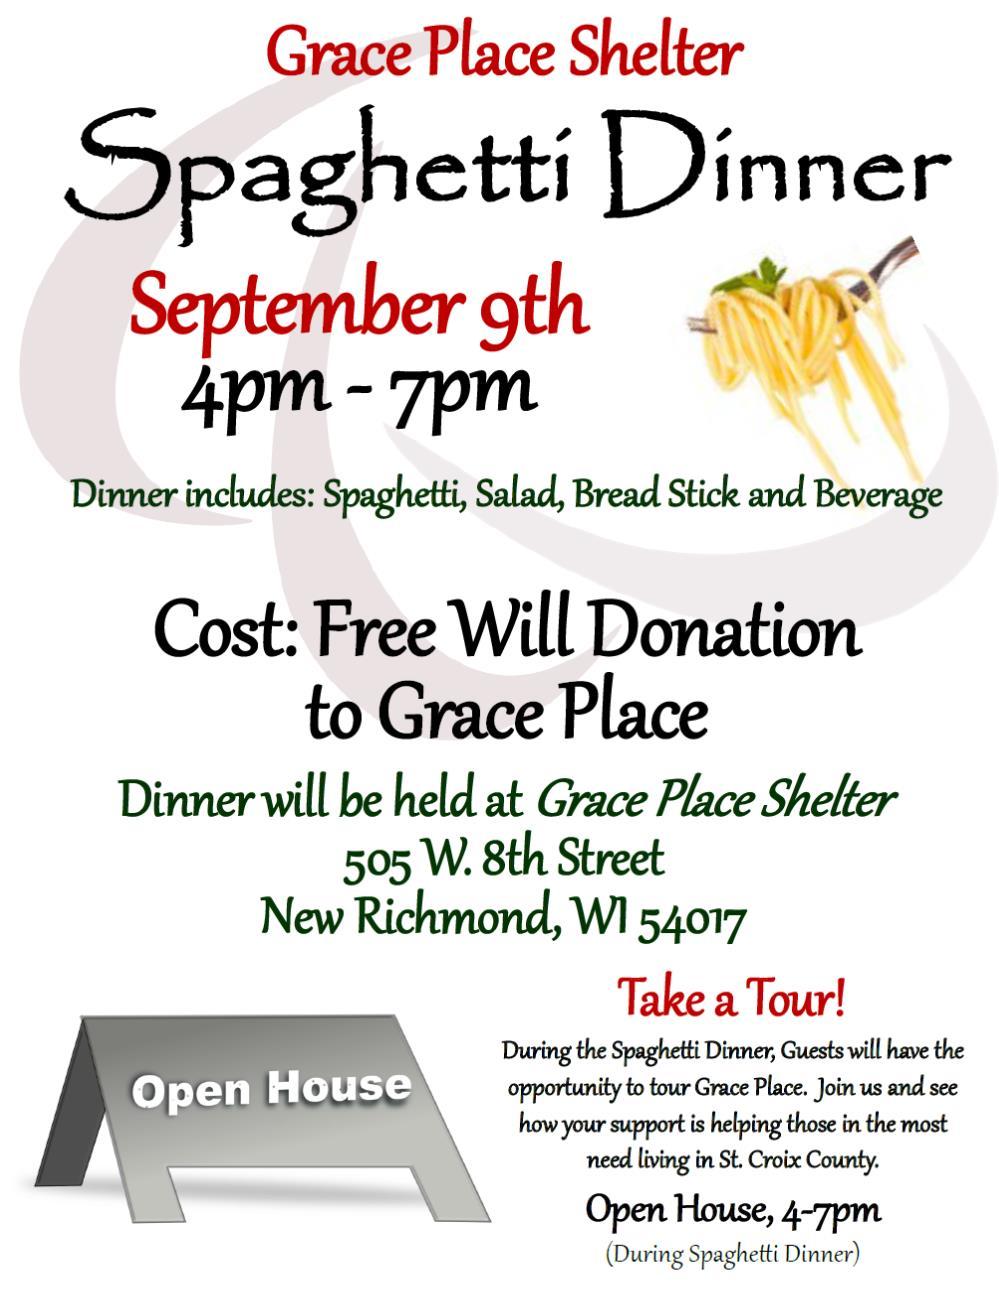 Spaghetti Dinner 2016 Grace Place